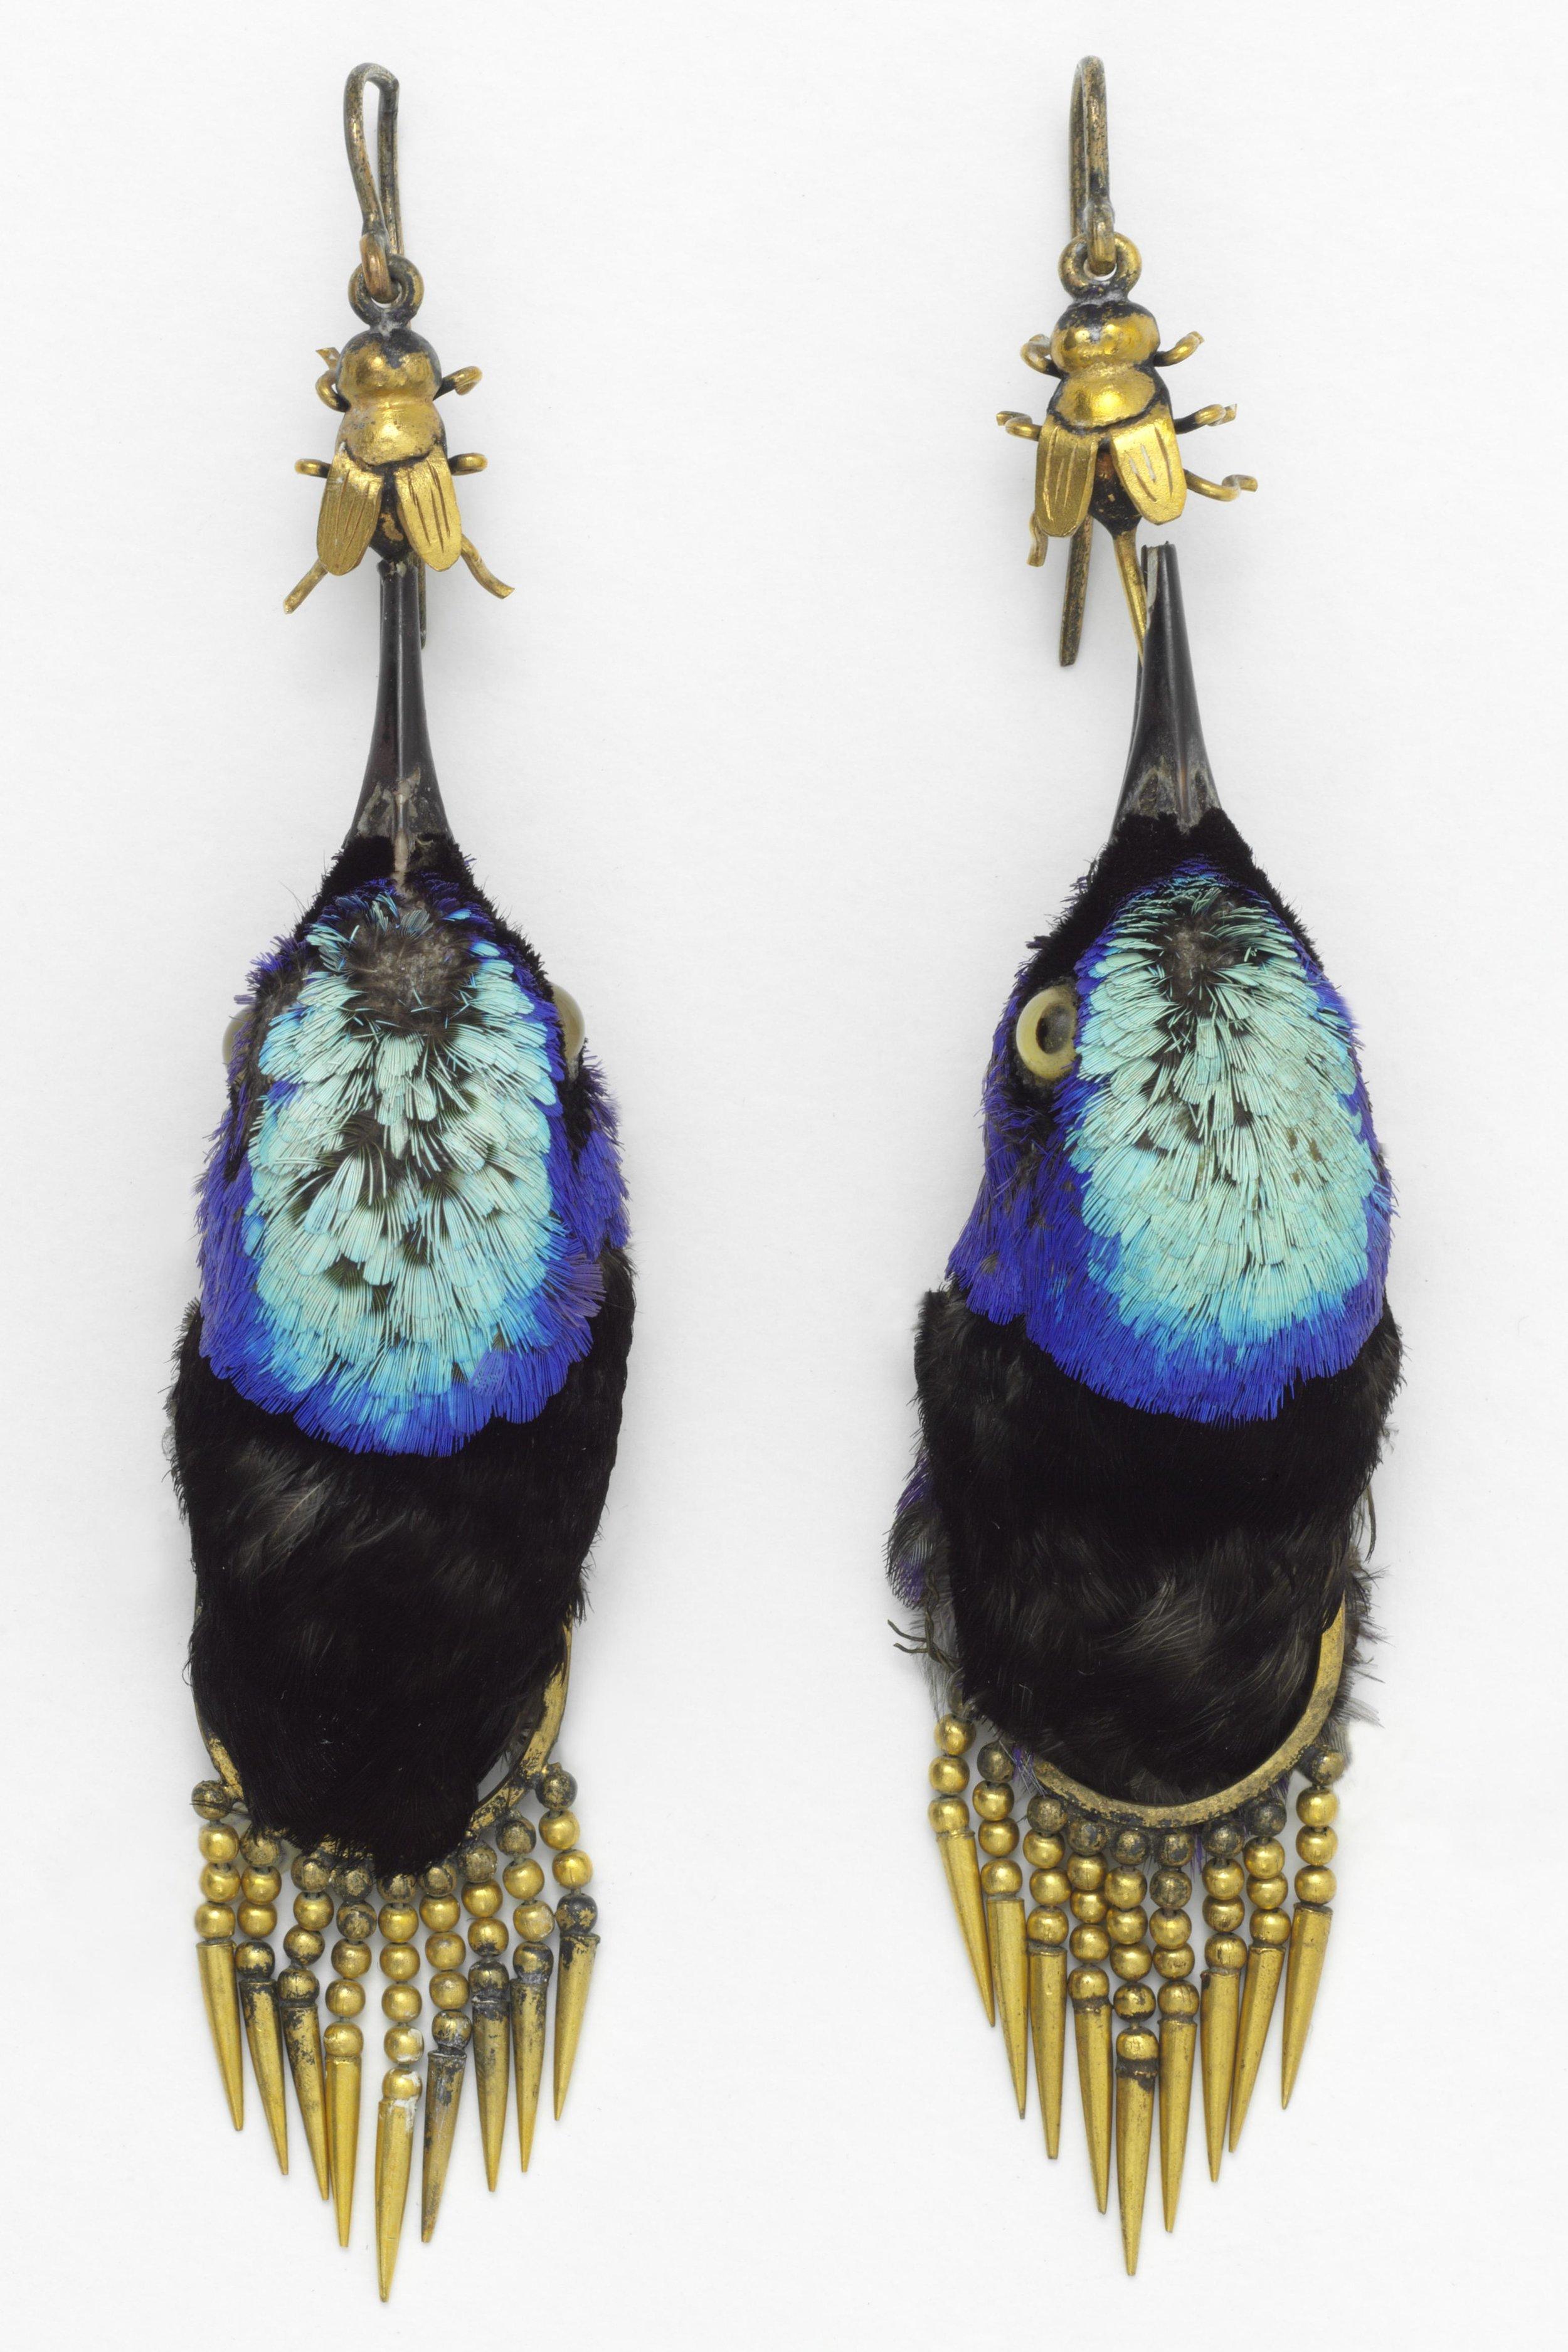 Earrings - Earrings made from heads of red legged honeycreeper birds.